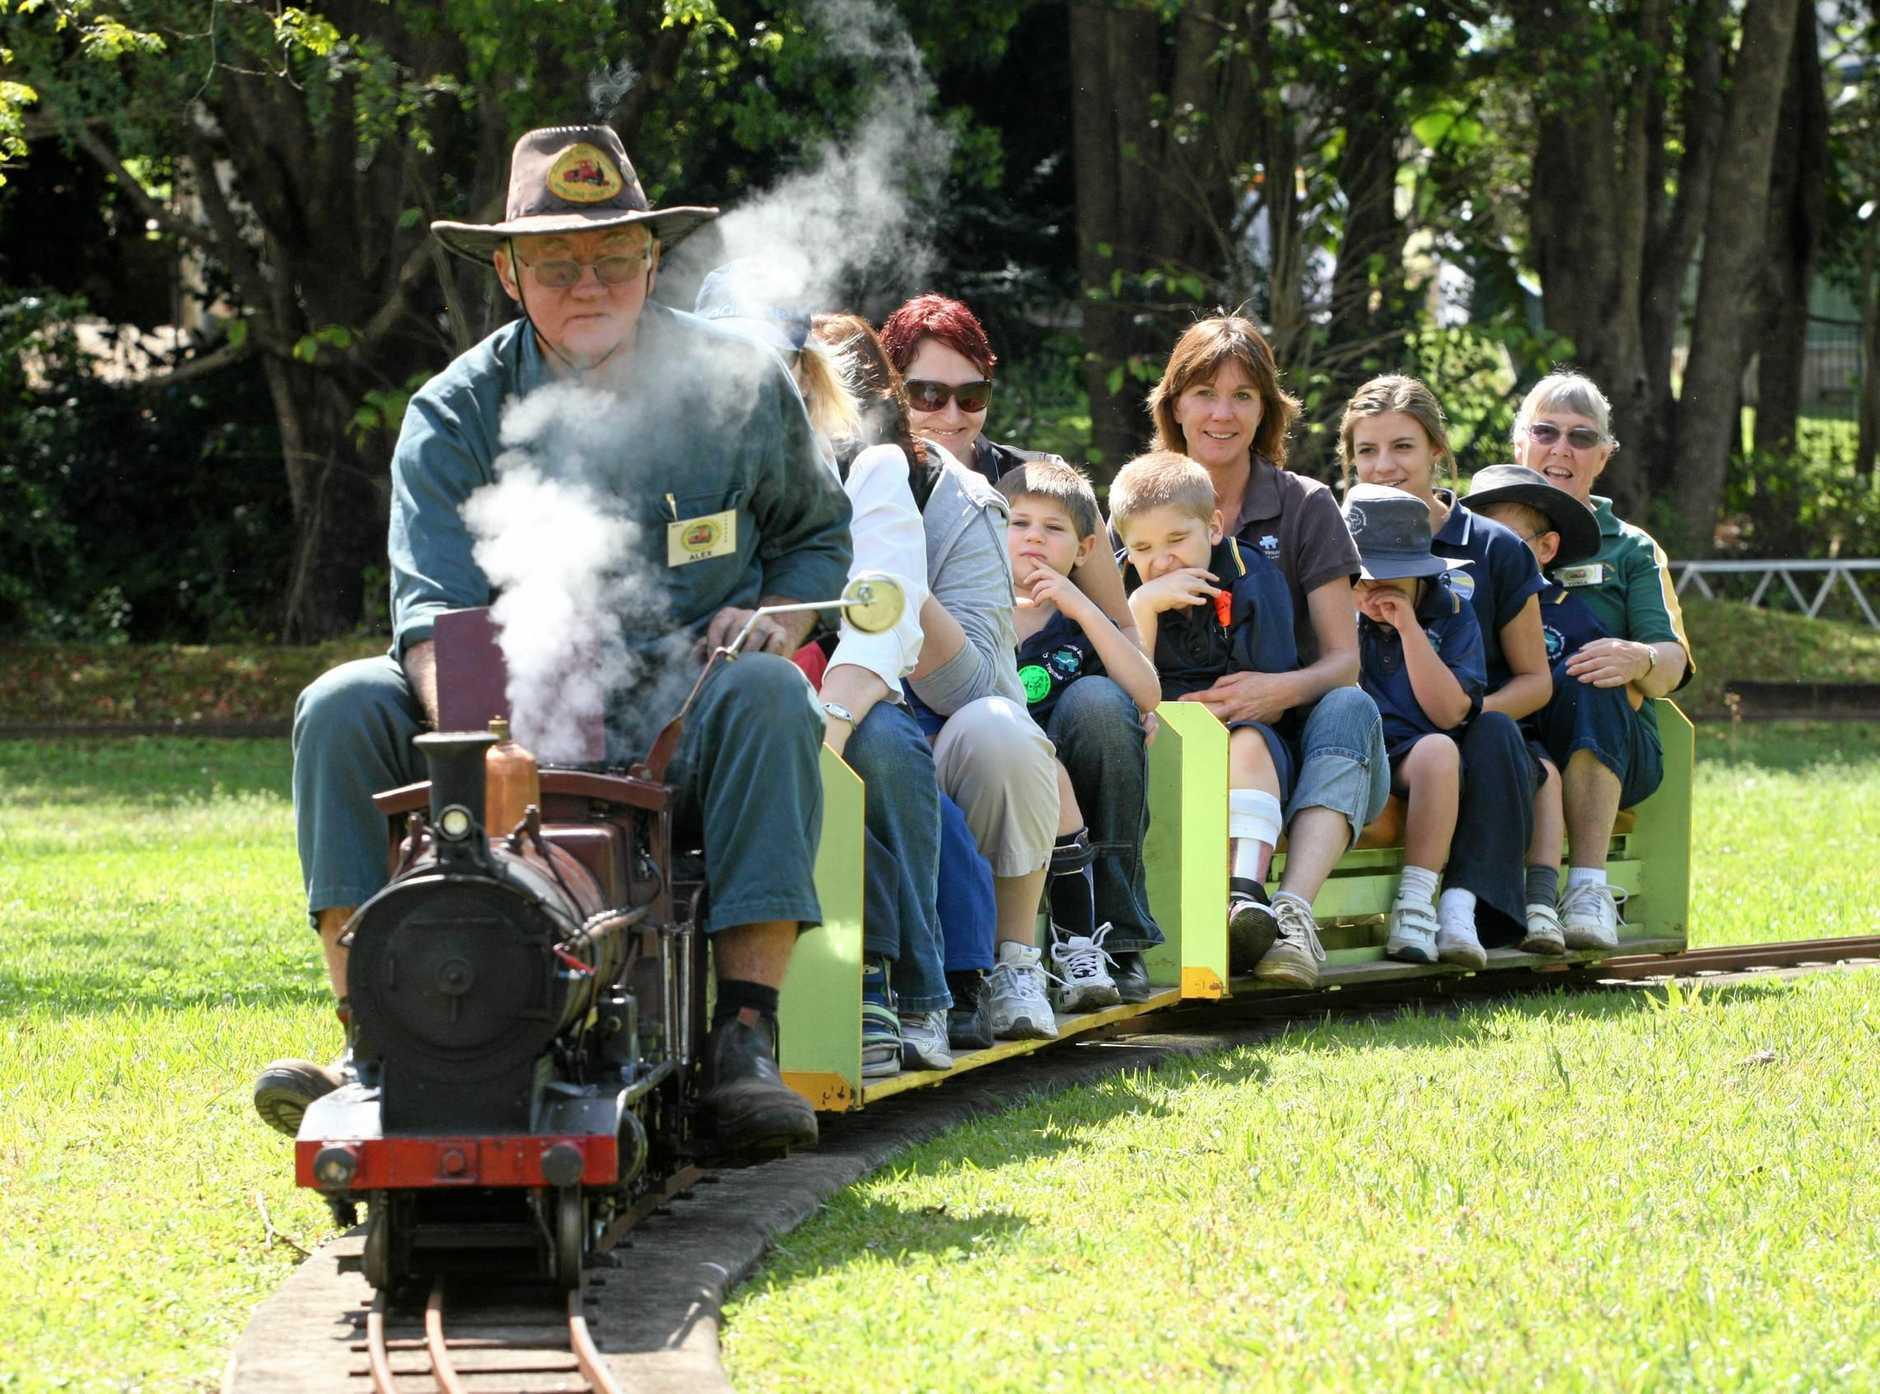 ALL ABOARD: Enjoy mini train rides at Nambour, courtesy of the Sunshine Coast Railway Modellers Society.